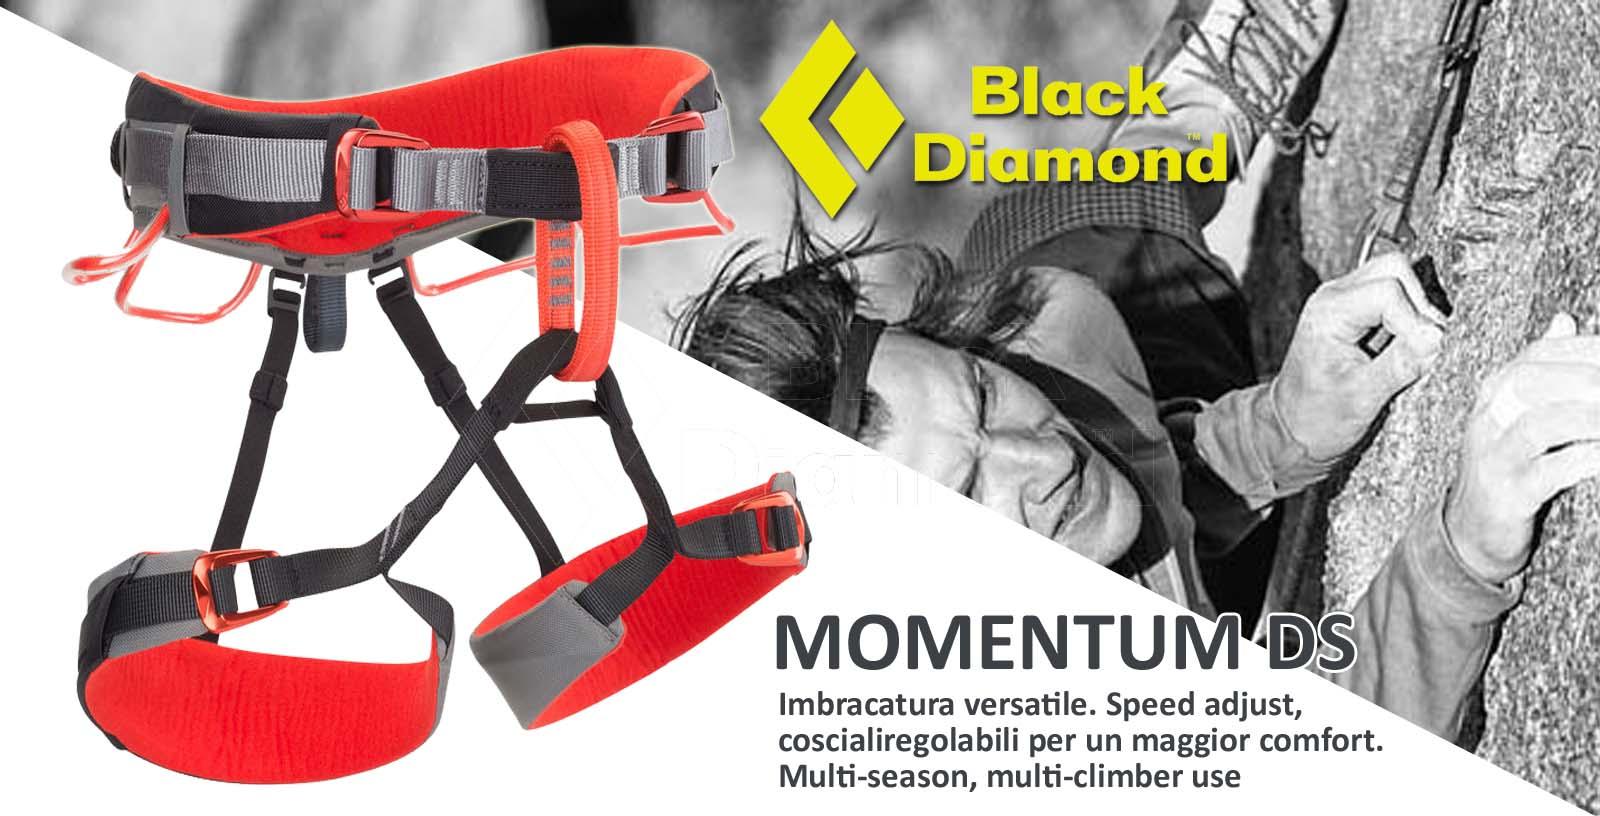 bd-momentum-ds